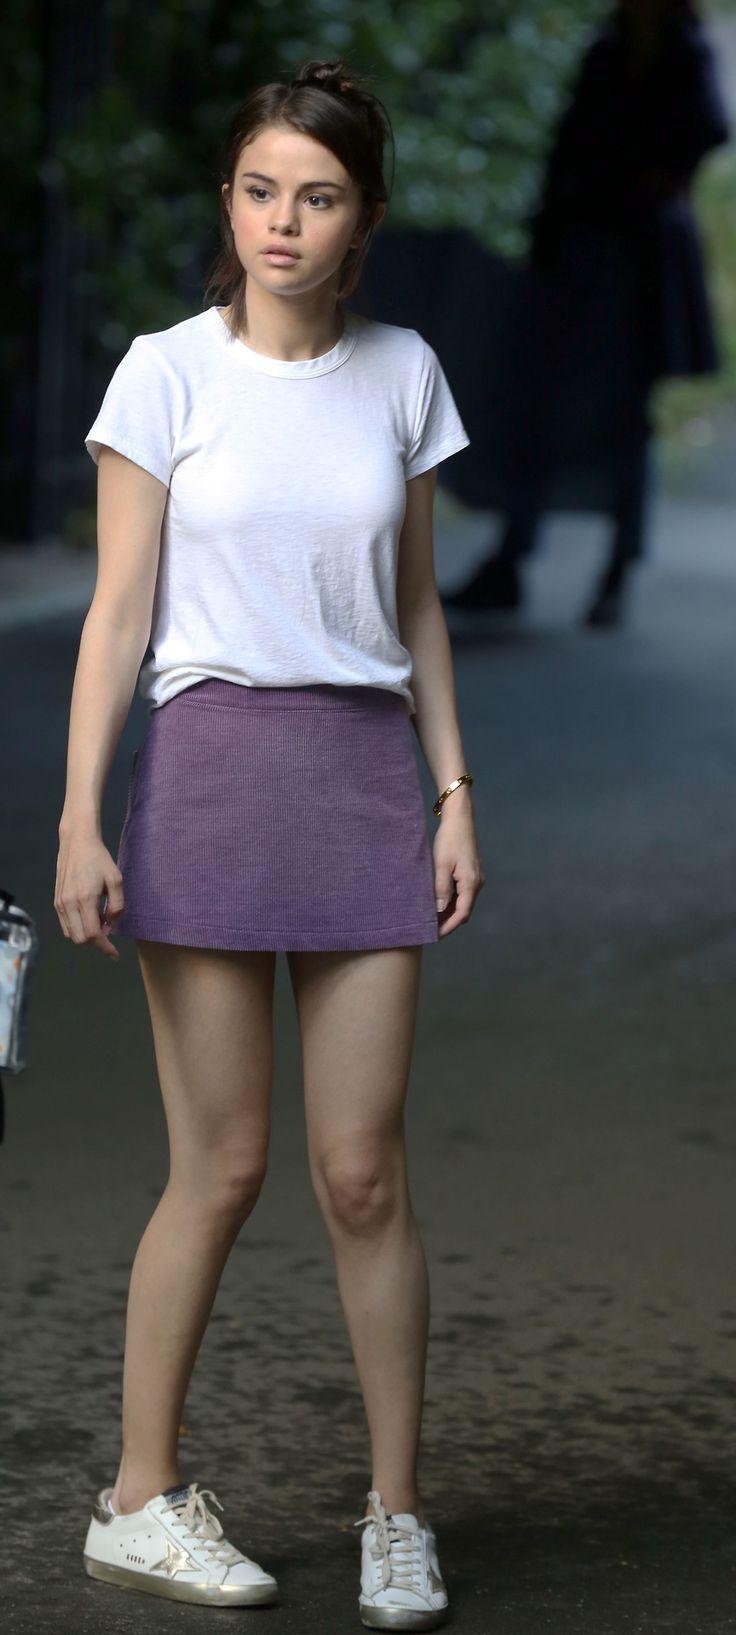 September 26: Selena seen on set of Woody Allen's film in New York, NY [HQs]